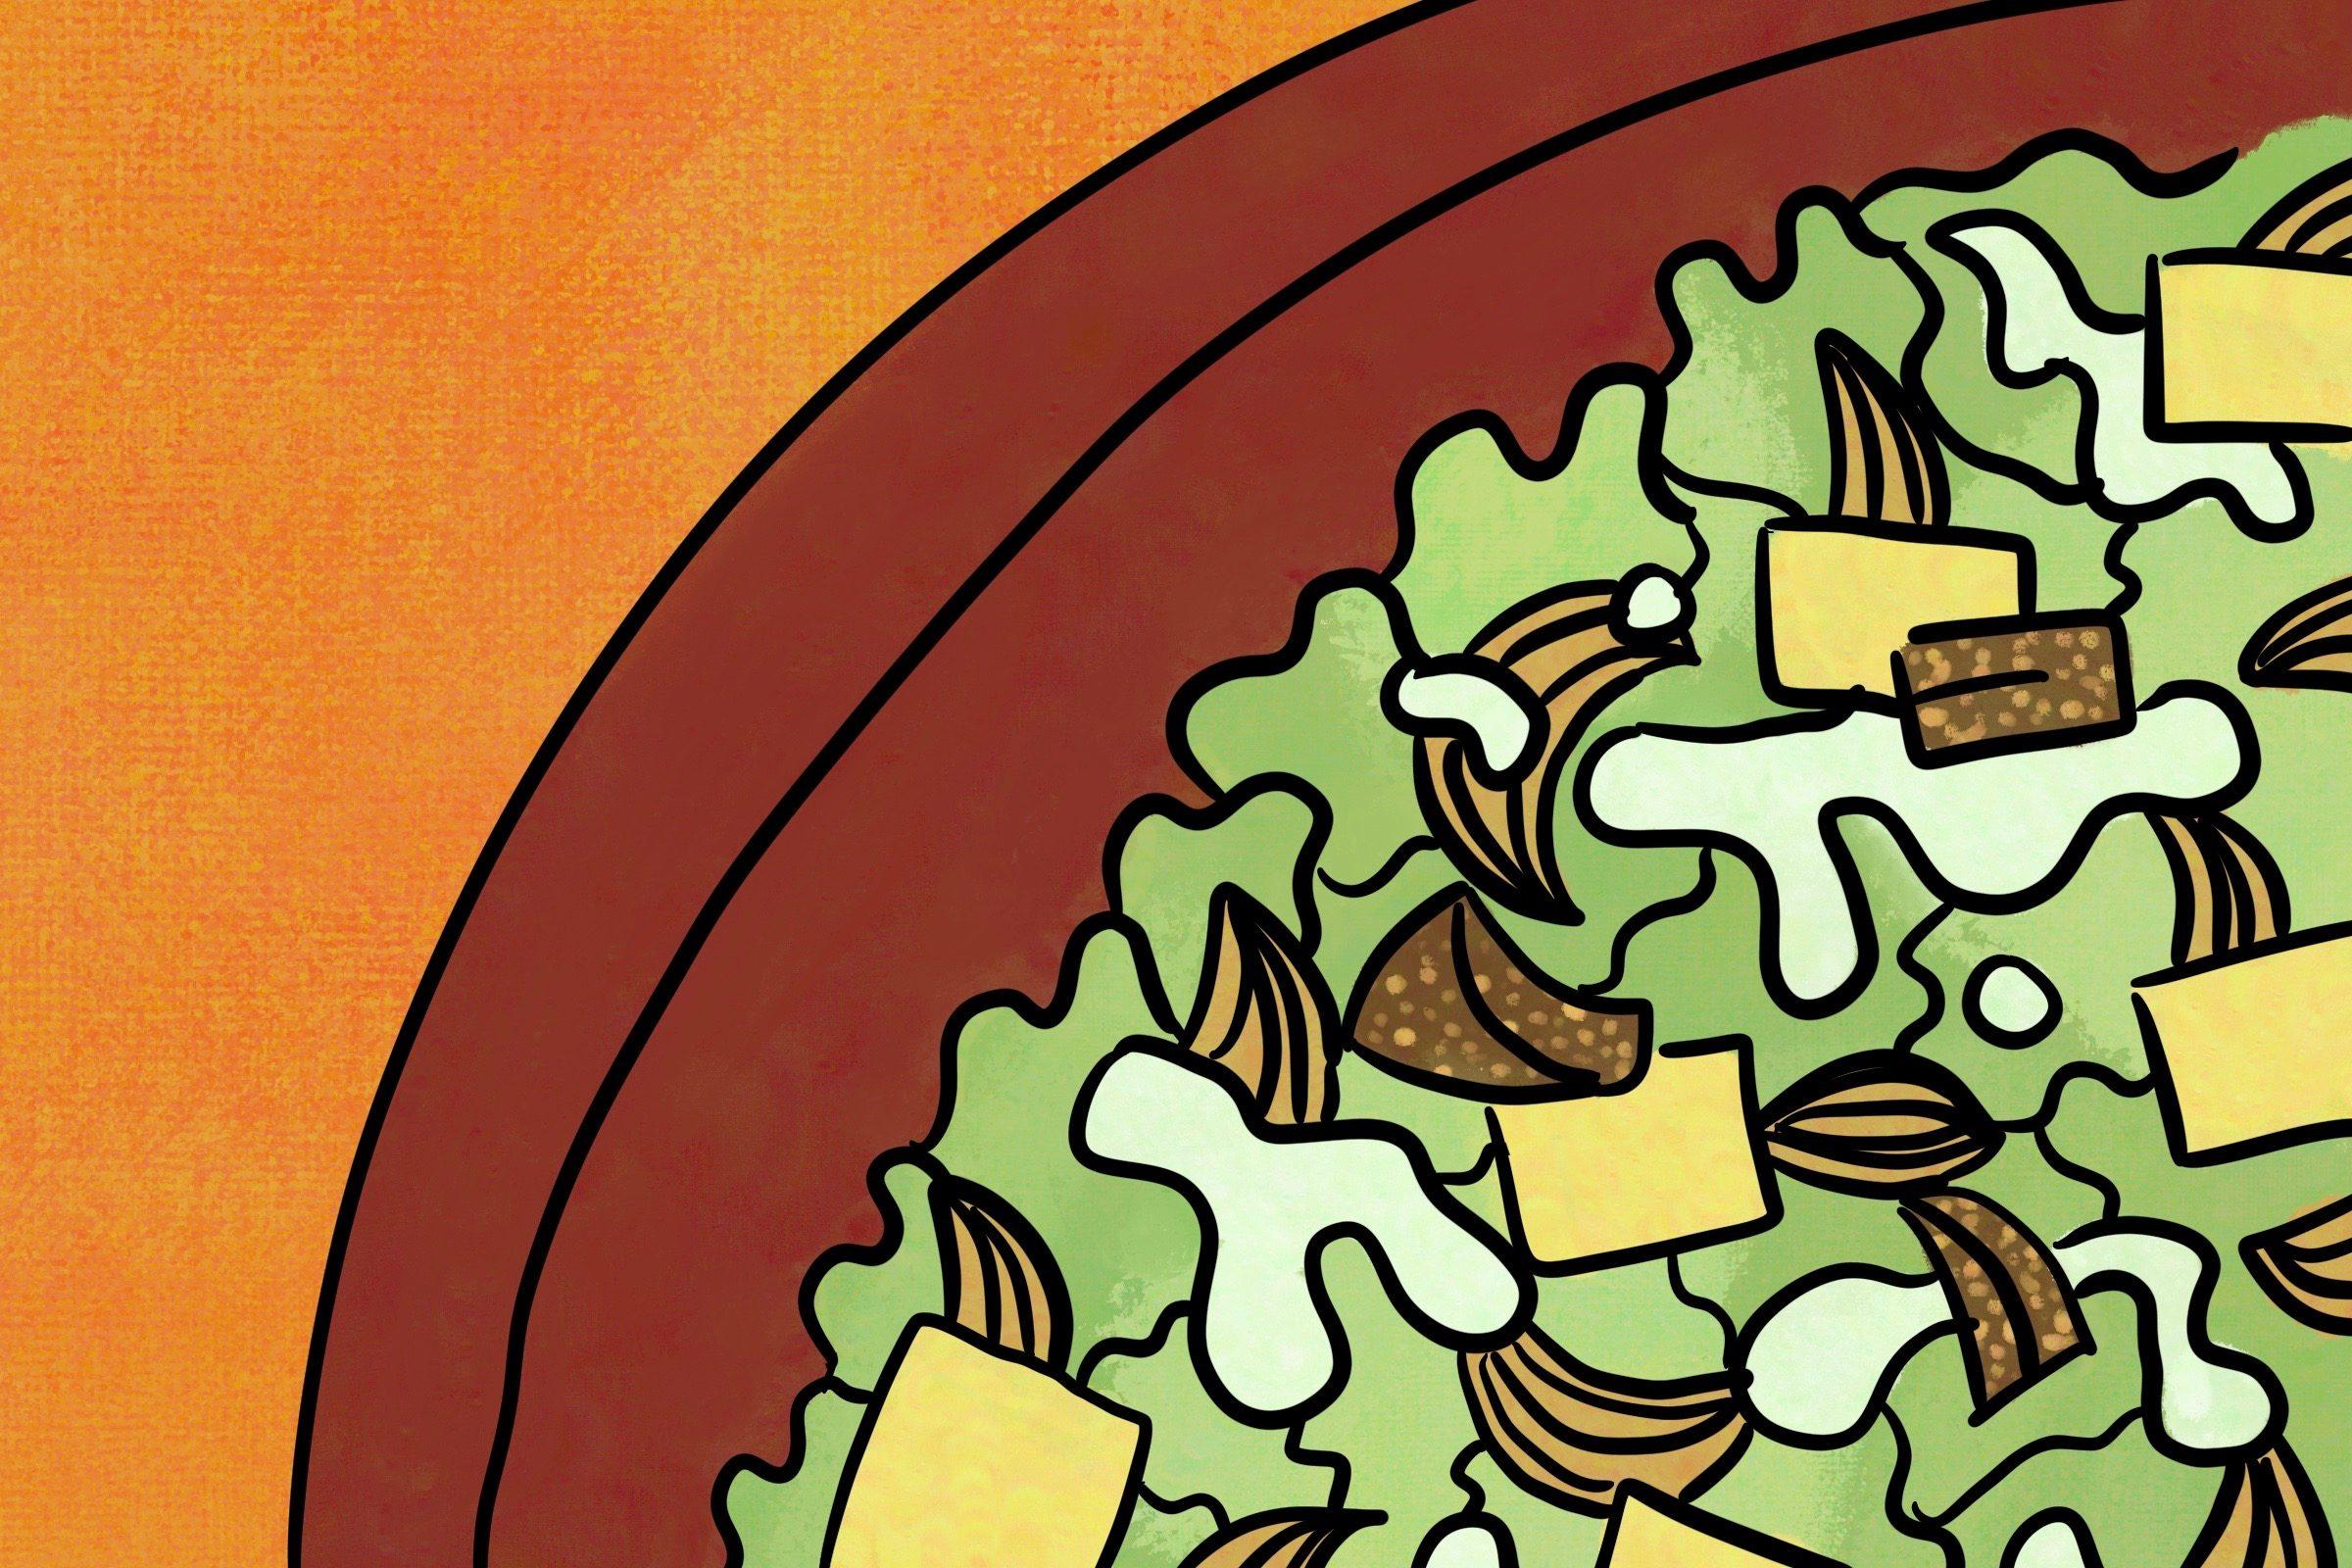 Caesar salad with extra garlic